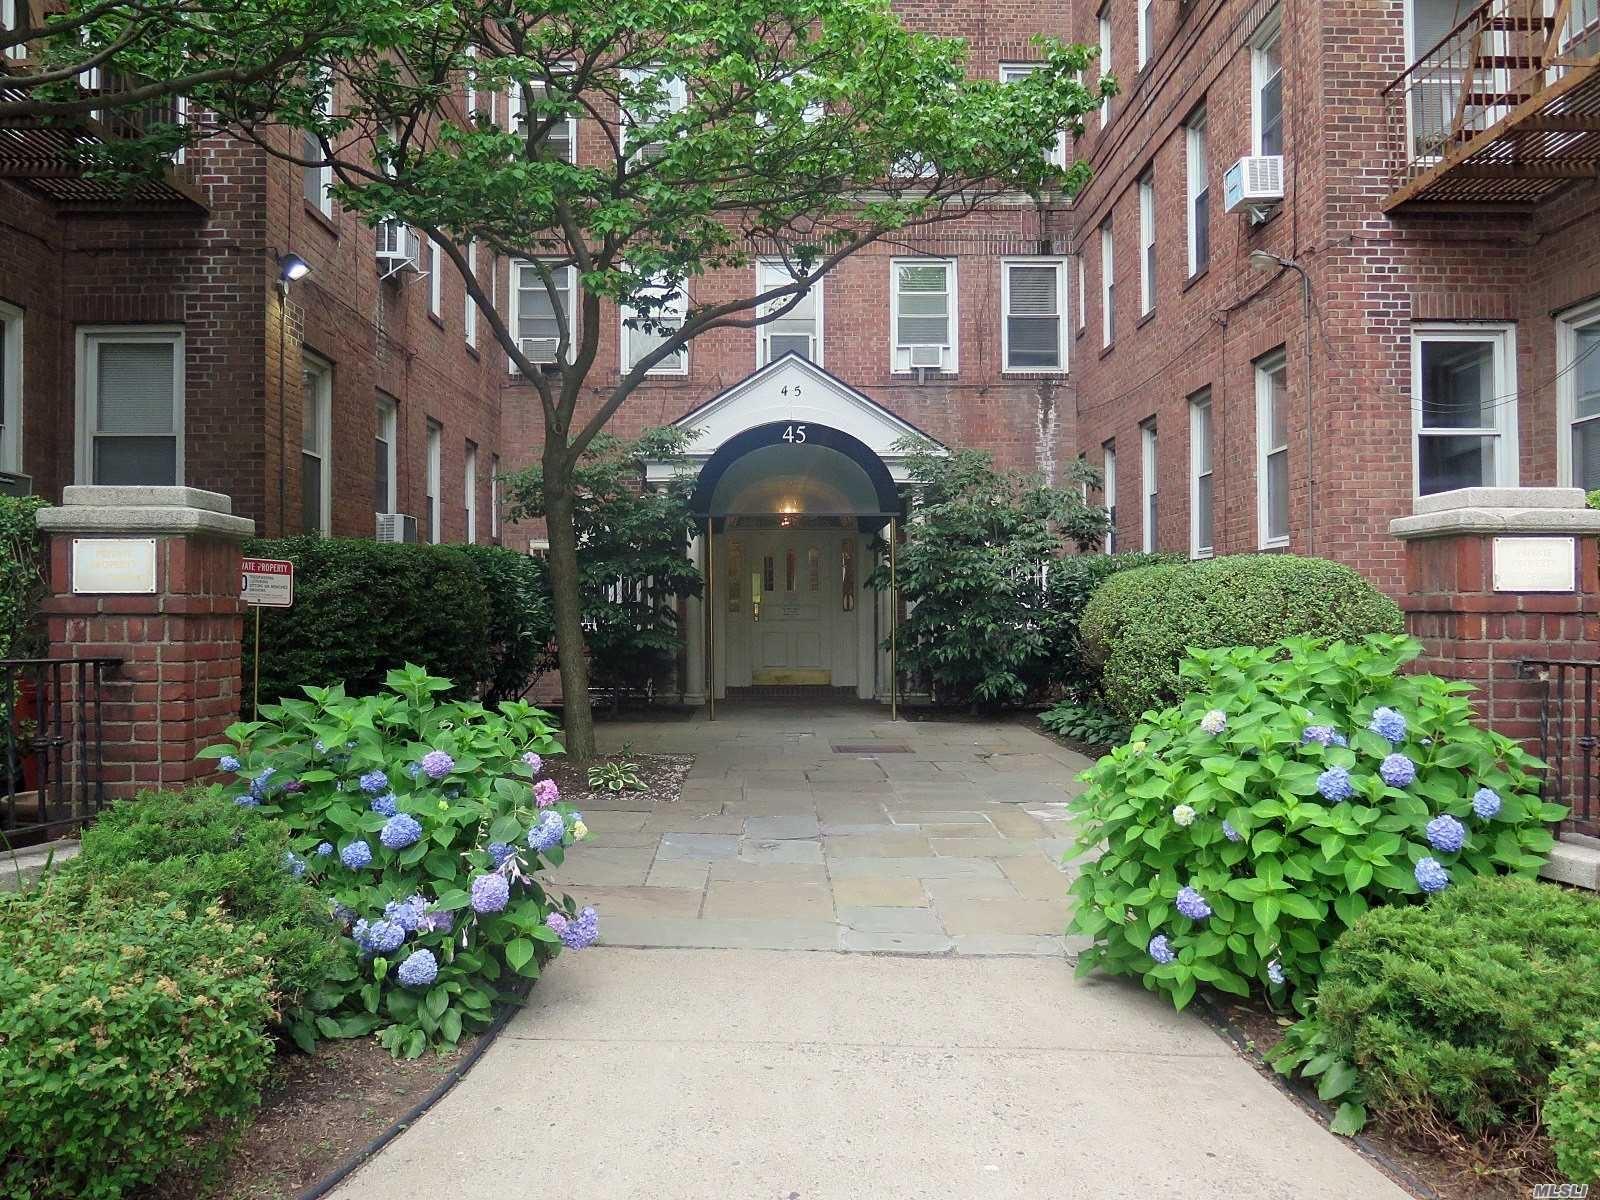 45 Kew Gardens Road #5M, Kew Gardens, NY 11415 - MLS#: 3205146